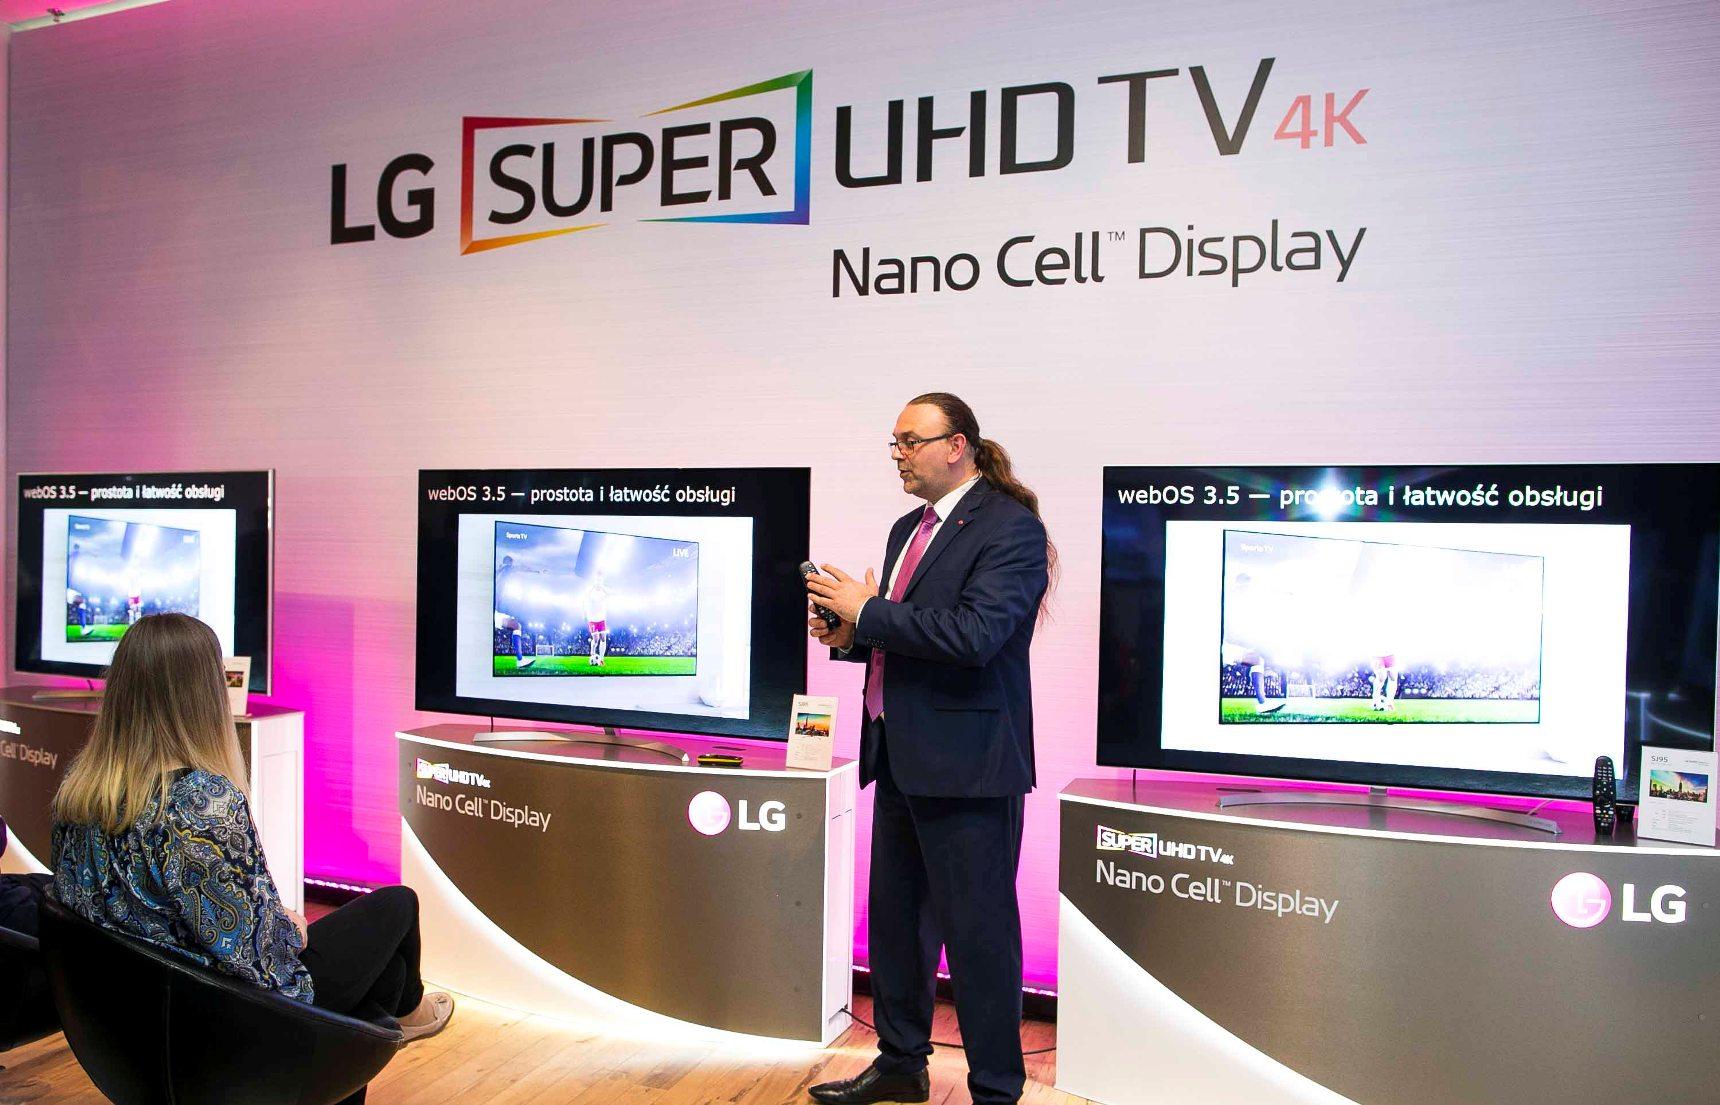 Polski debiut technologii Nano Cell – najnowsze telewizory LG Super UHD 2017 już na polskim rynku